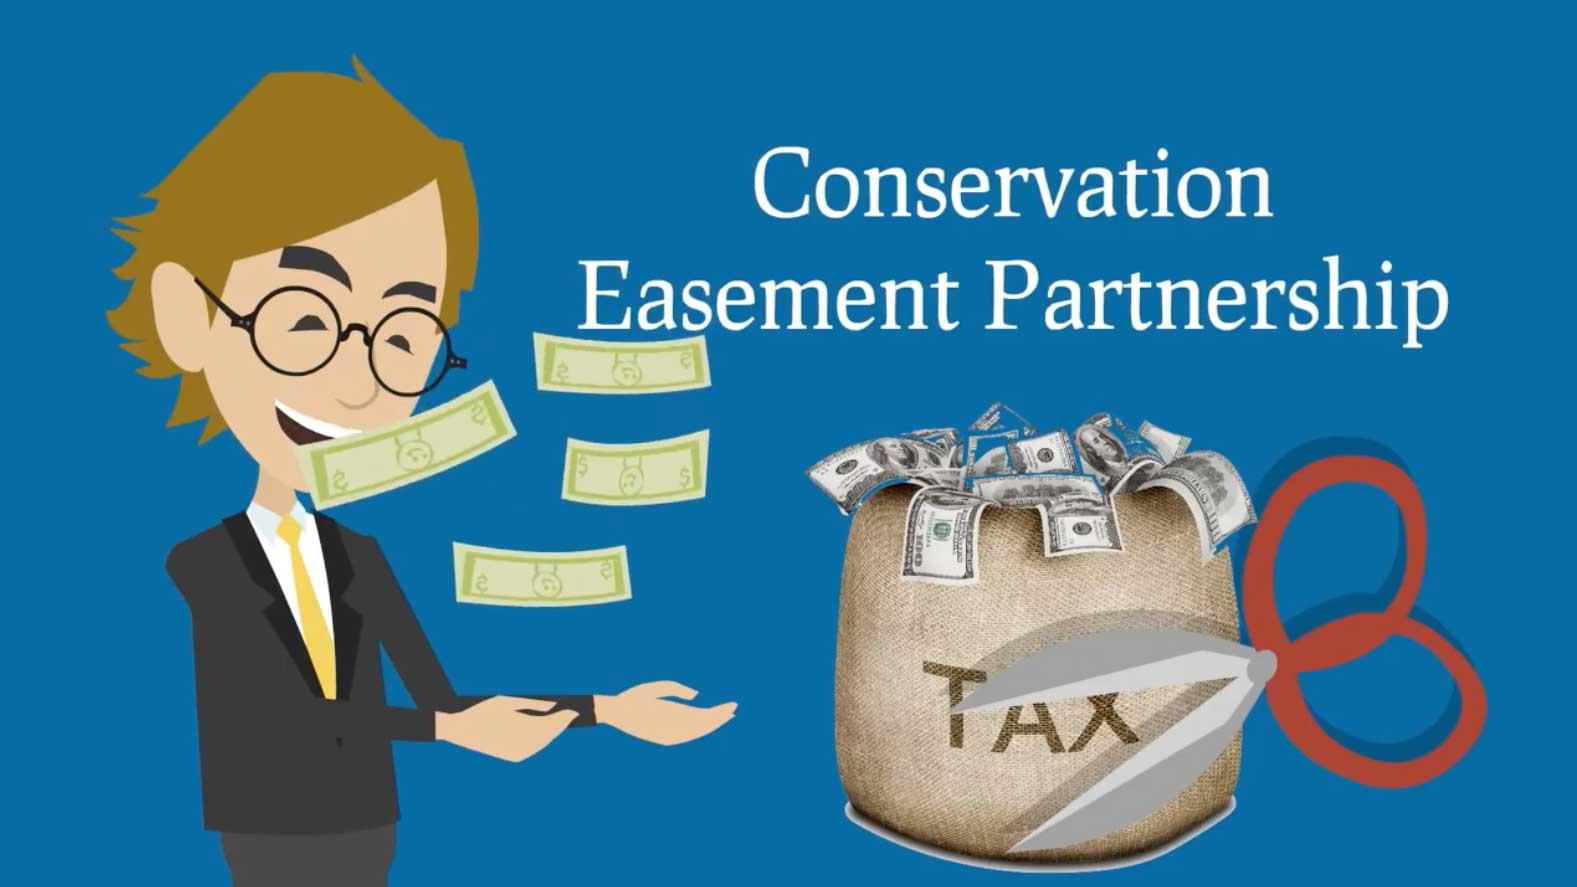 Conservation Easement Partnerships